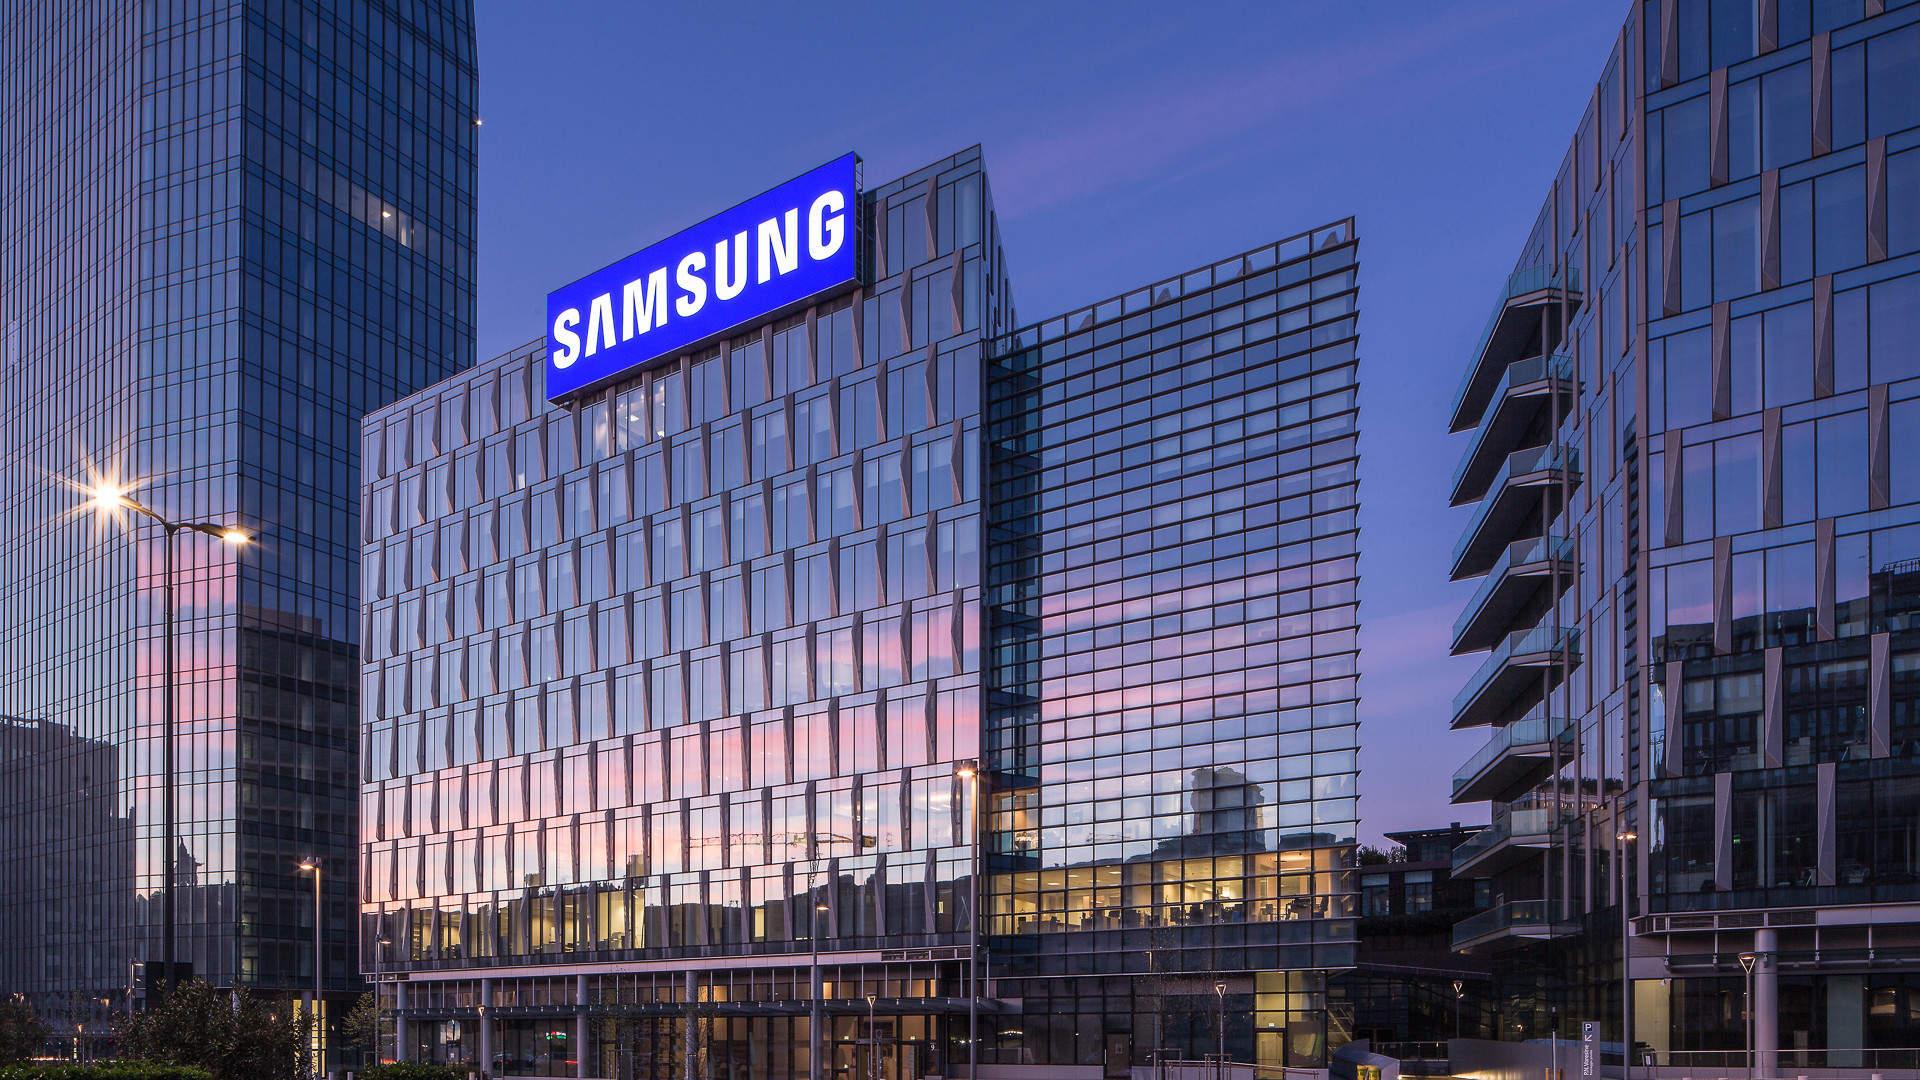 Samsung partnered with Xilinx